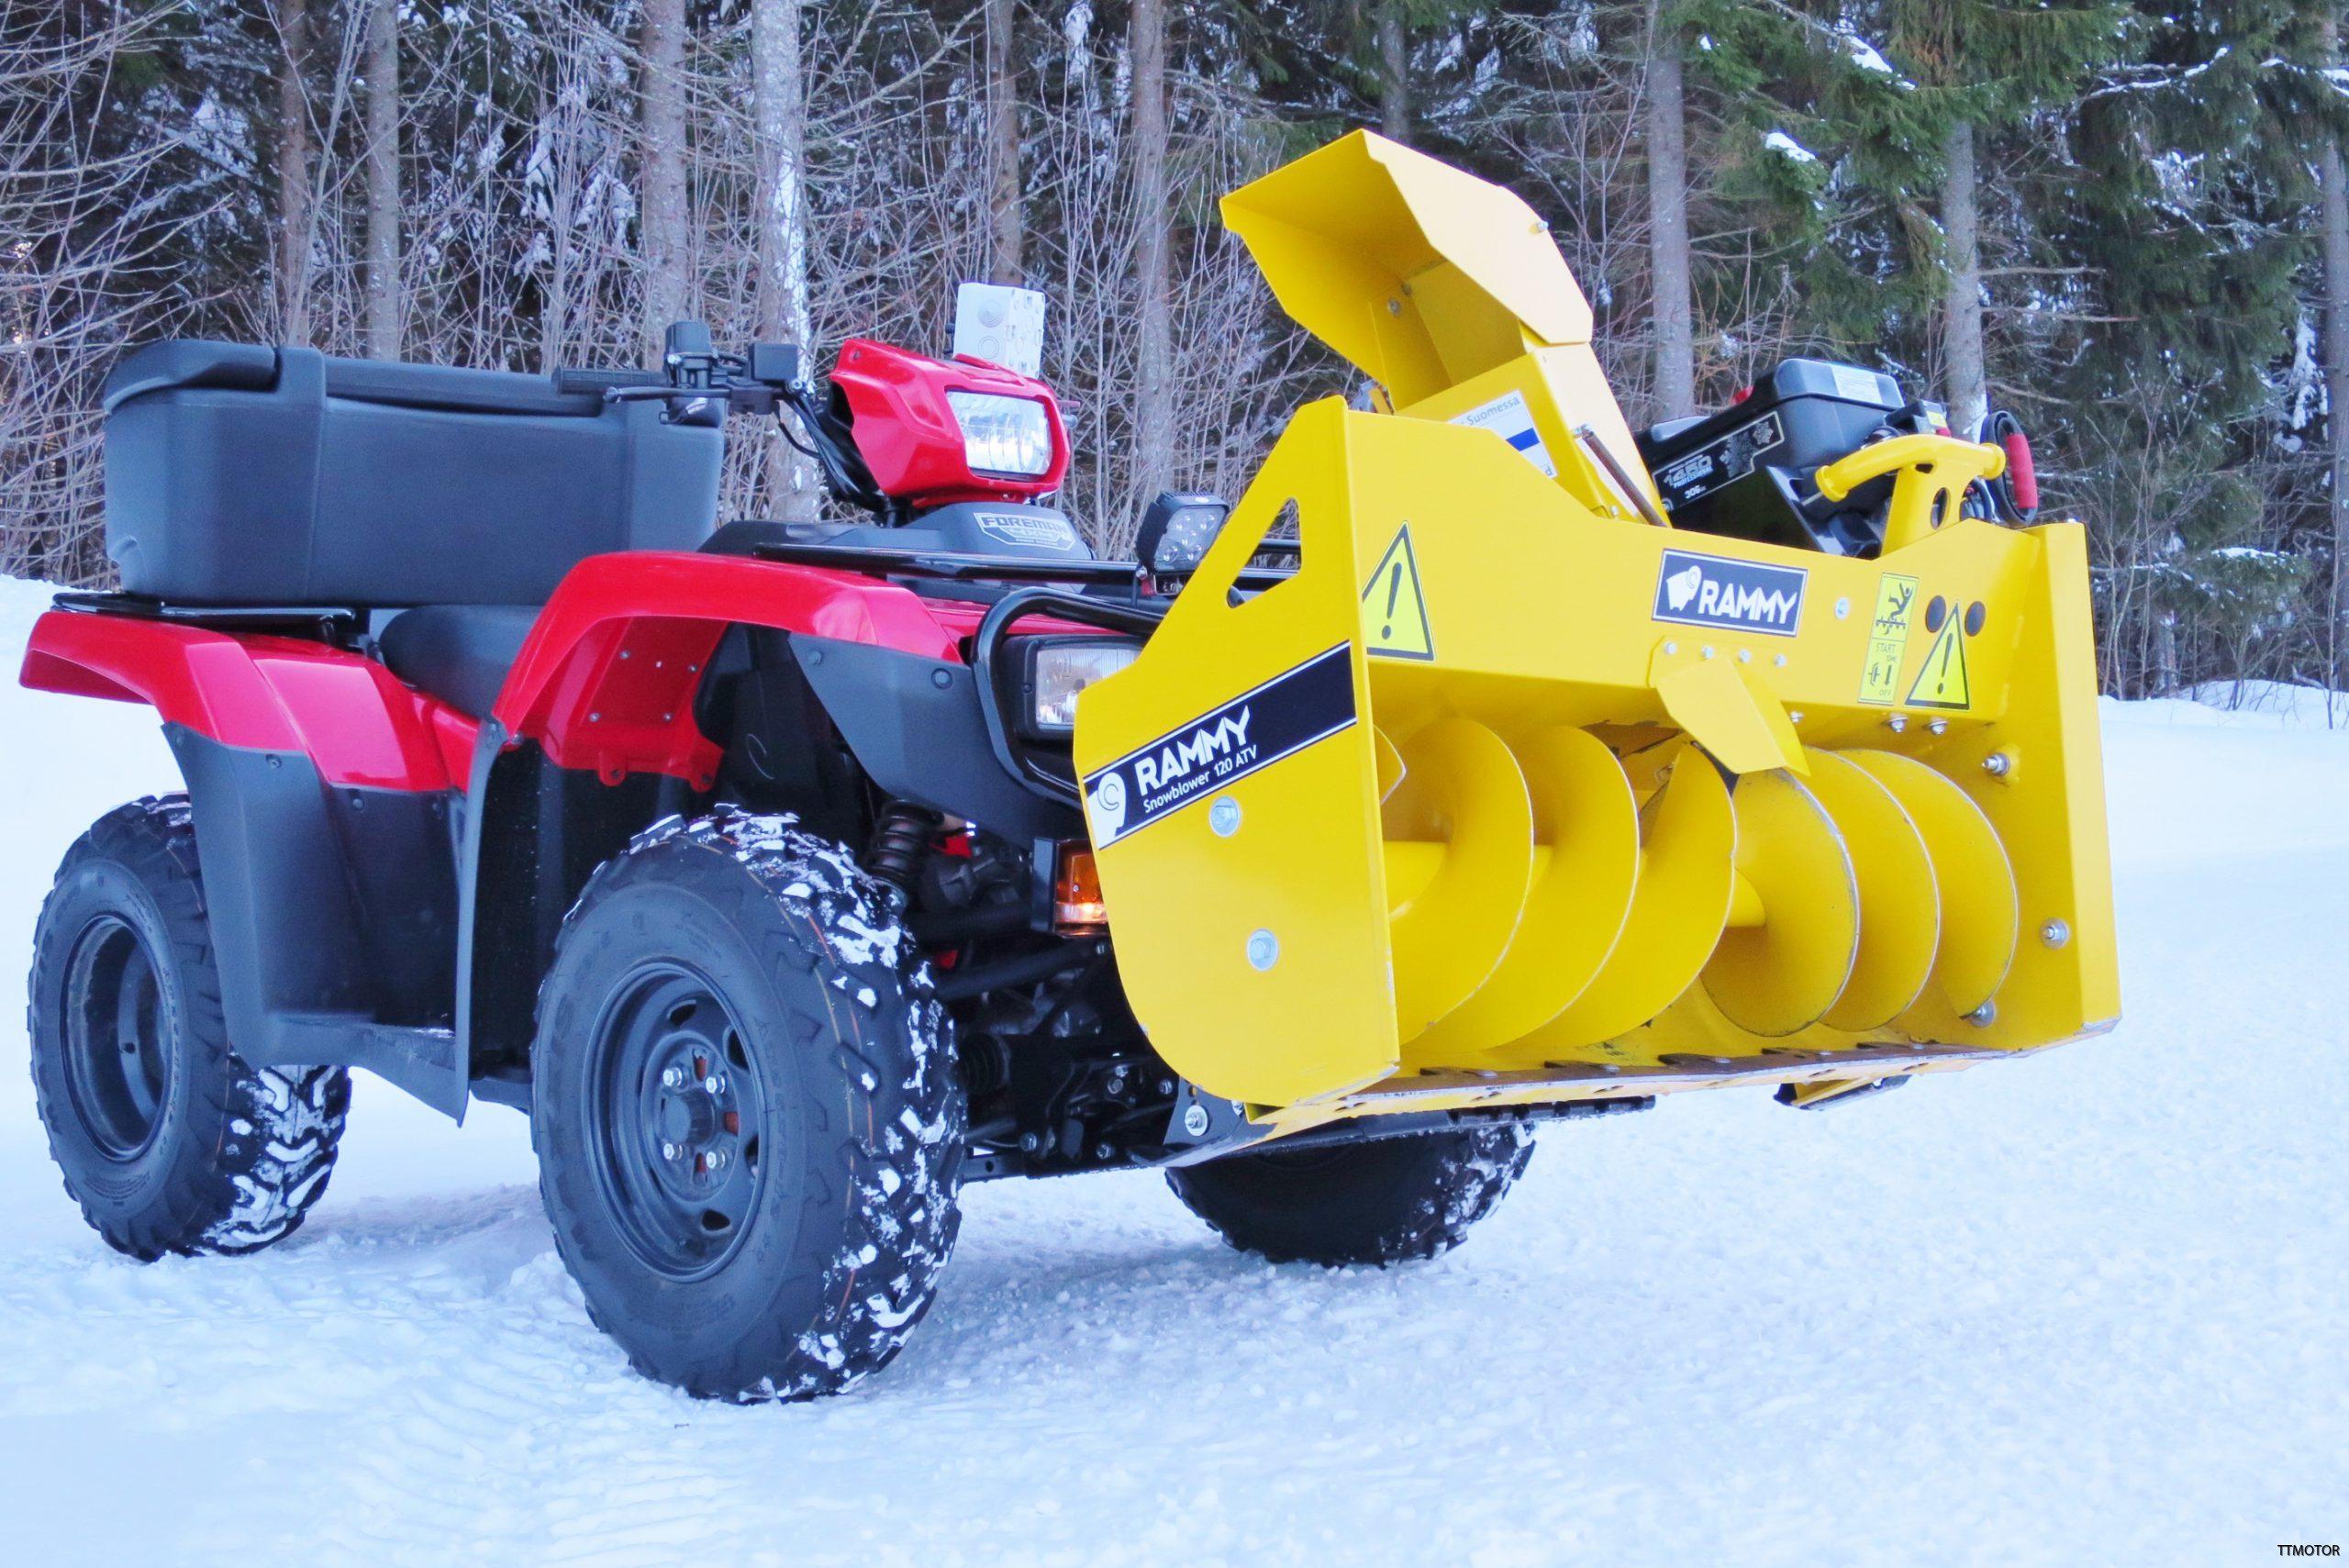 Rammy-Snowblower-EC-120-ATV-2019-8